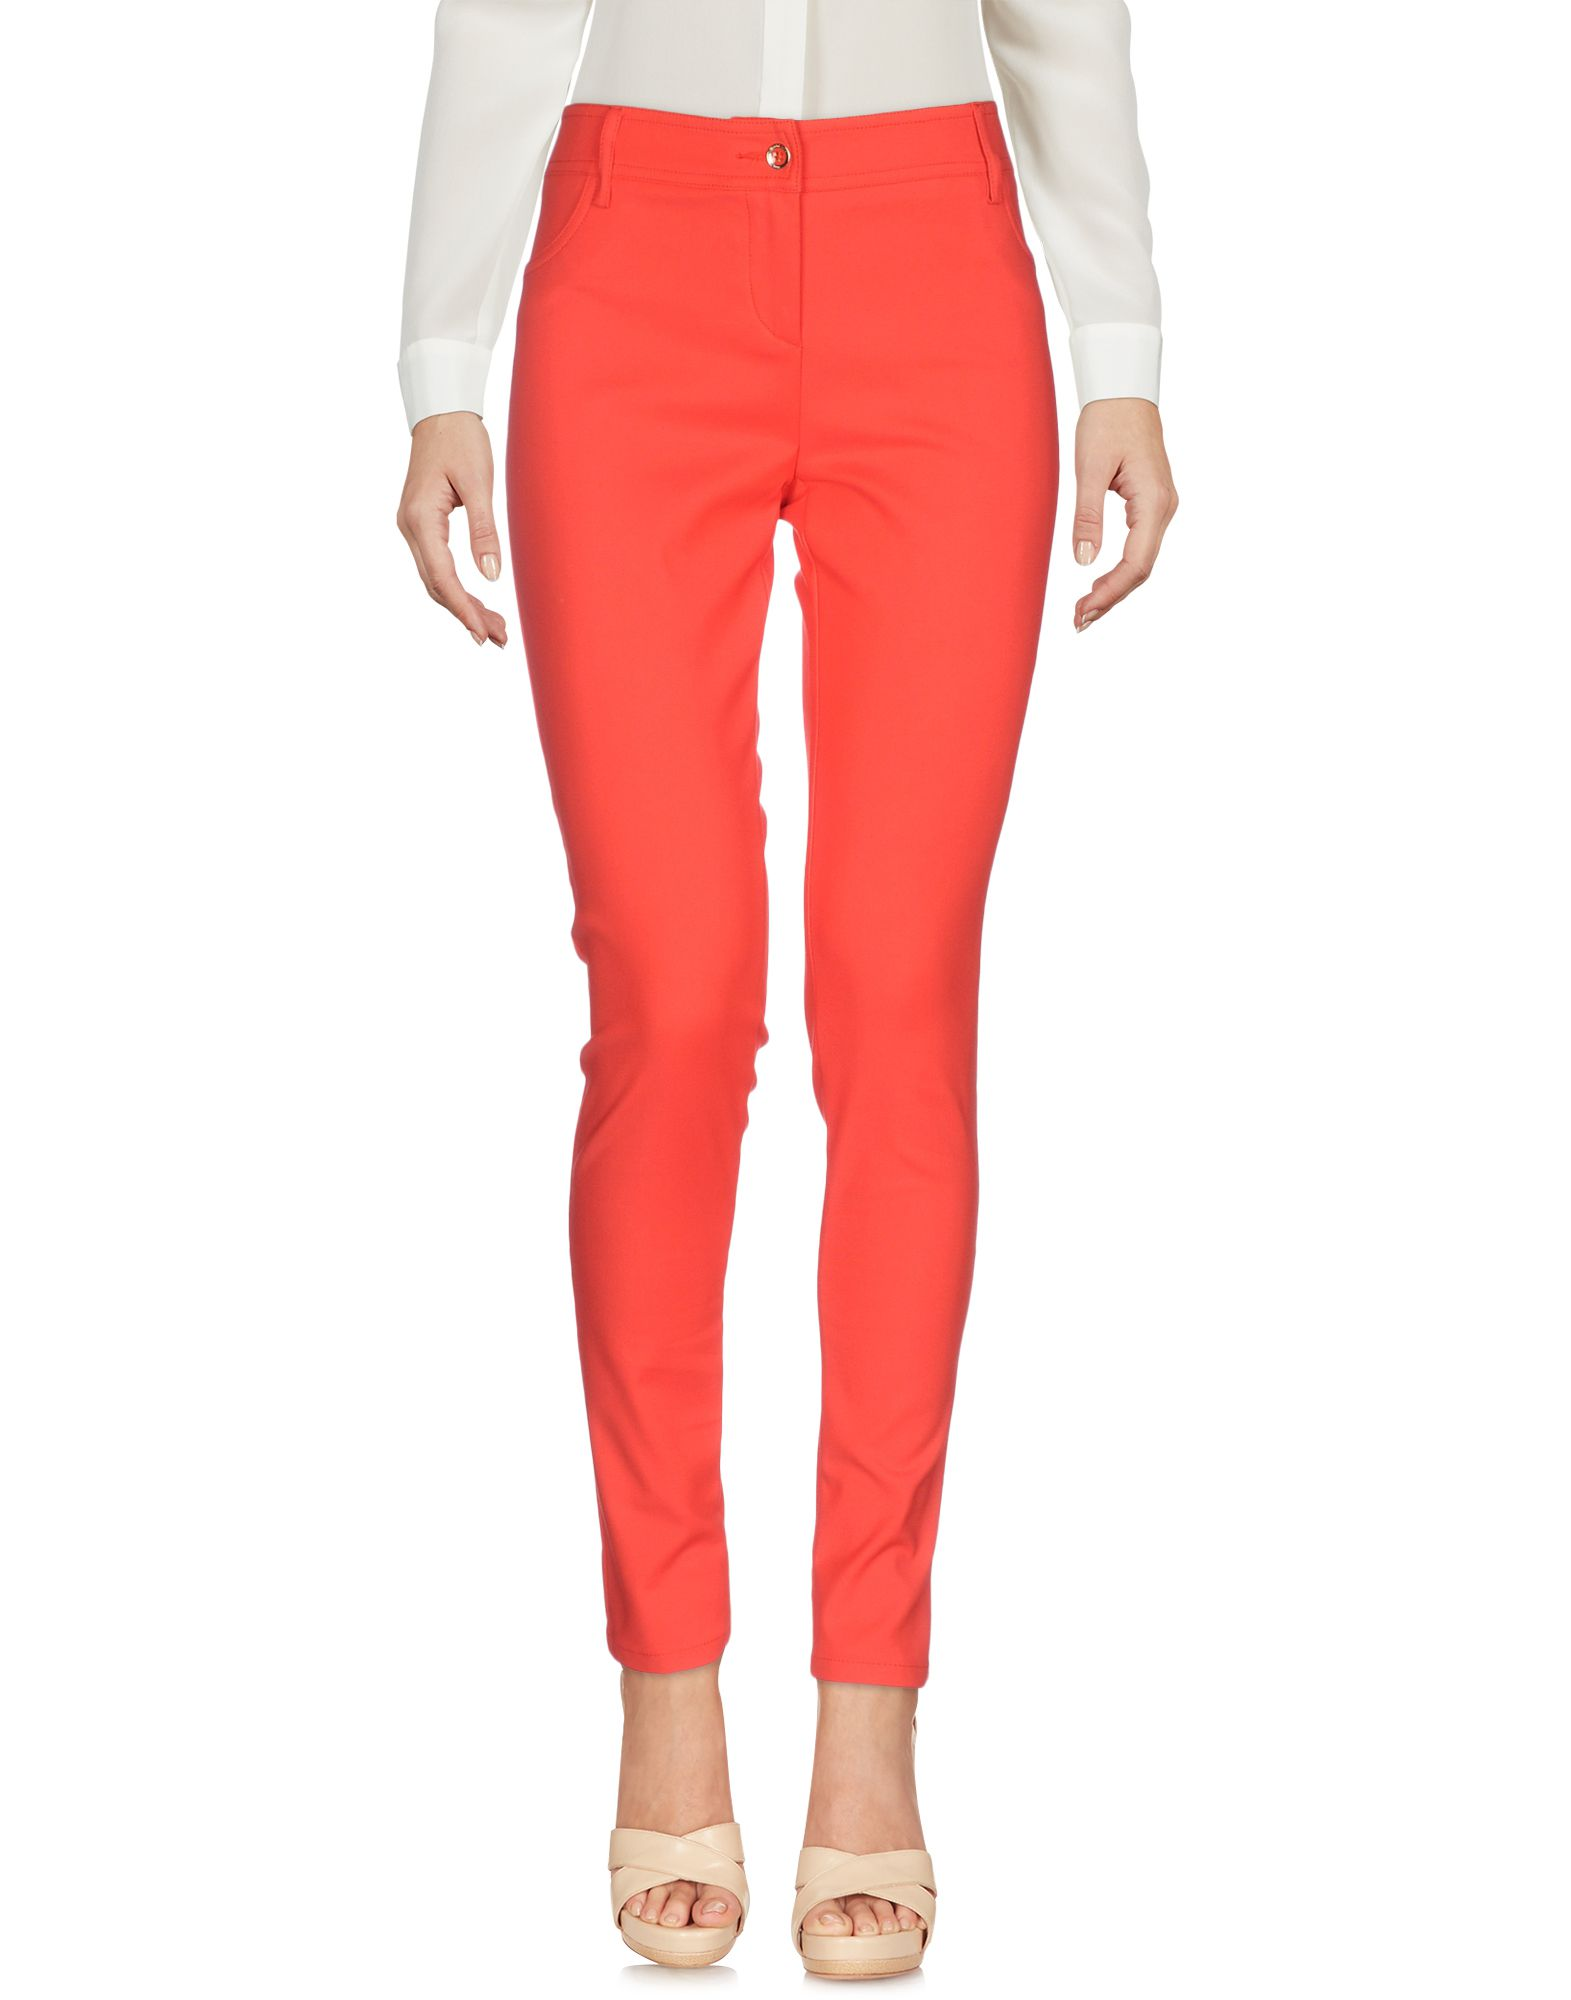 GUESS BY MARCIANO Damen Hose Farbe Rot Größe 5 jetztbilligerkaufen